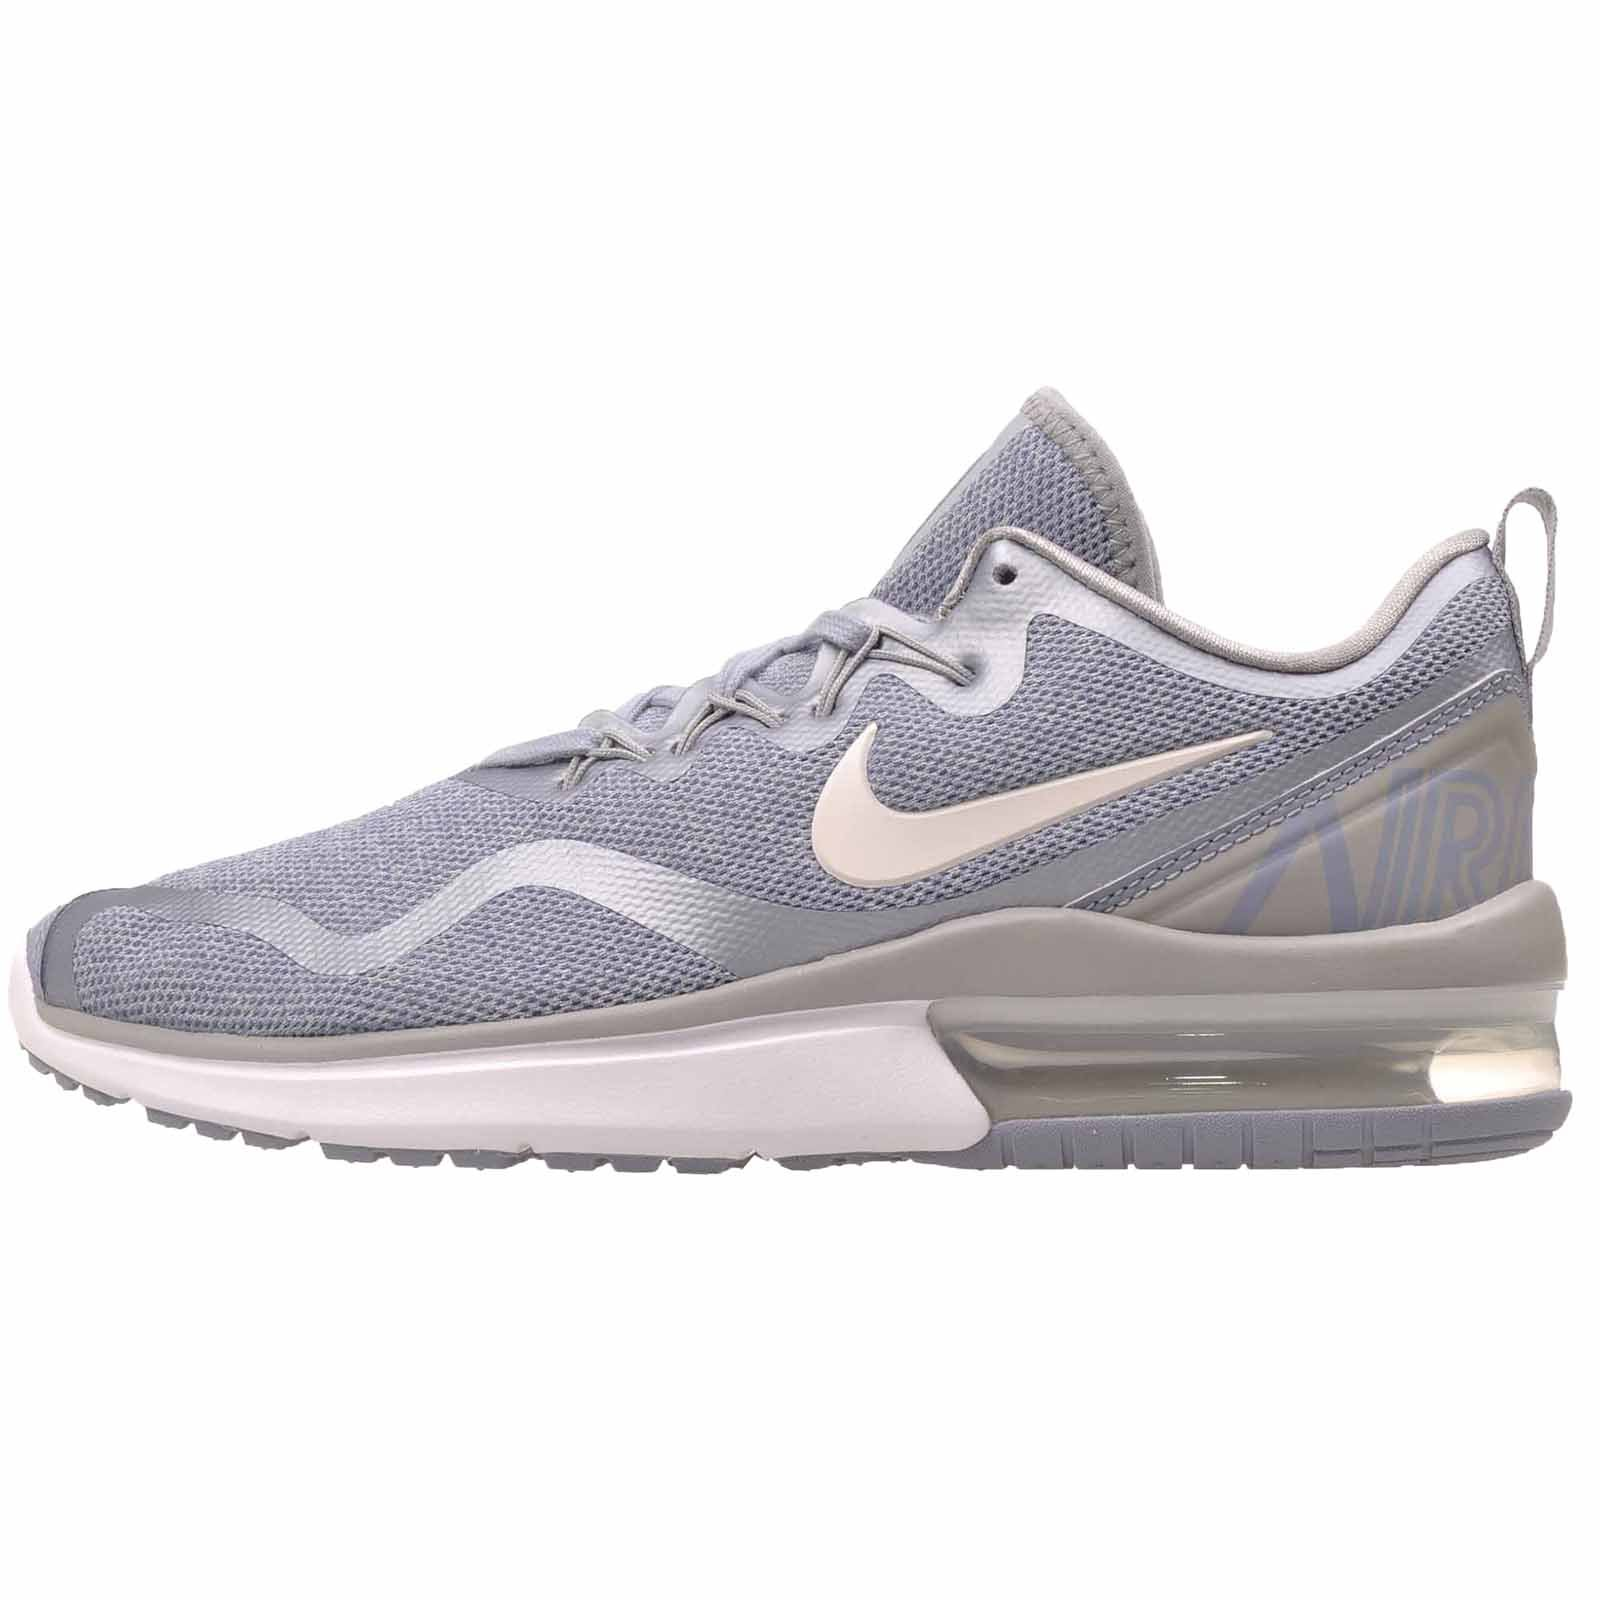 NIKE Womens Air Max Fury Running Shoes